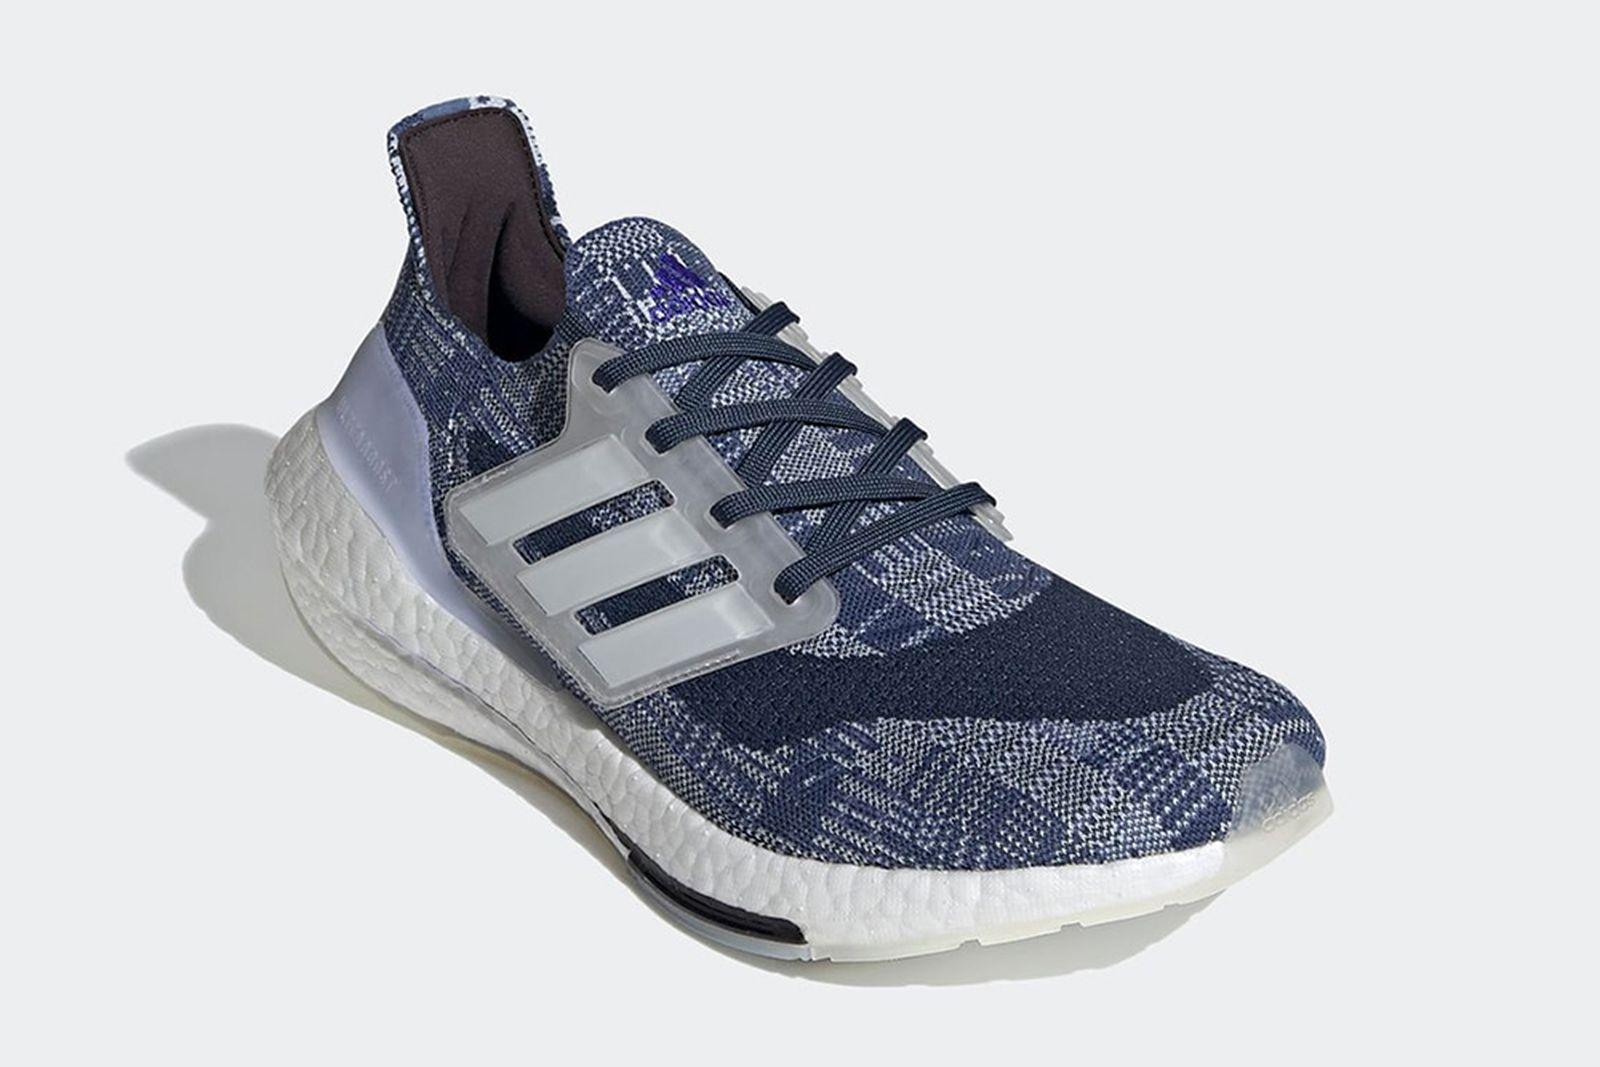 sneaker-news-1-02-22-2021-02